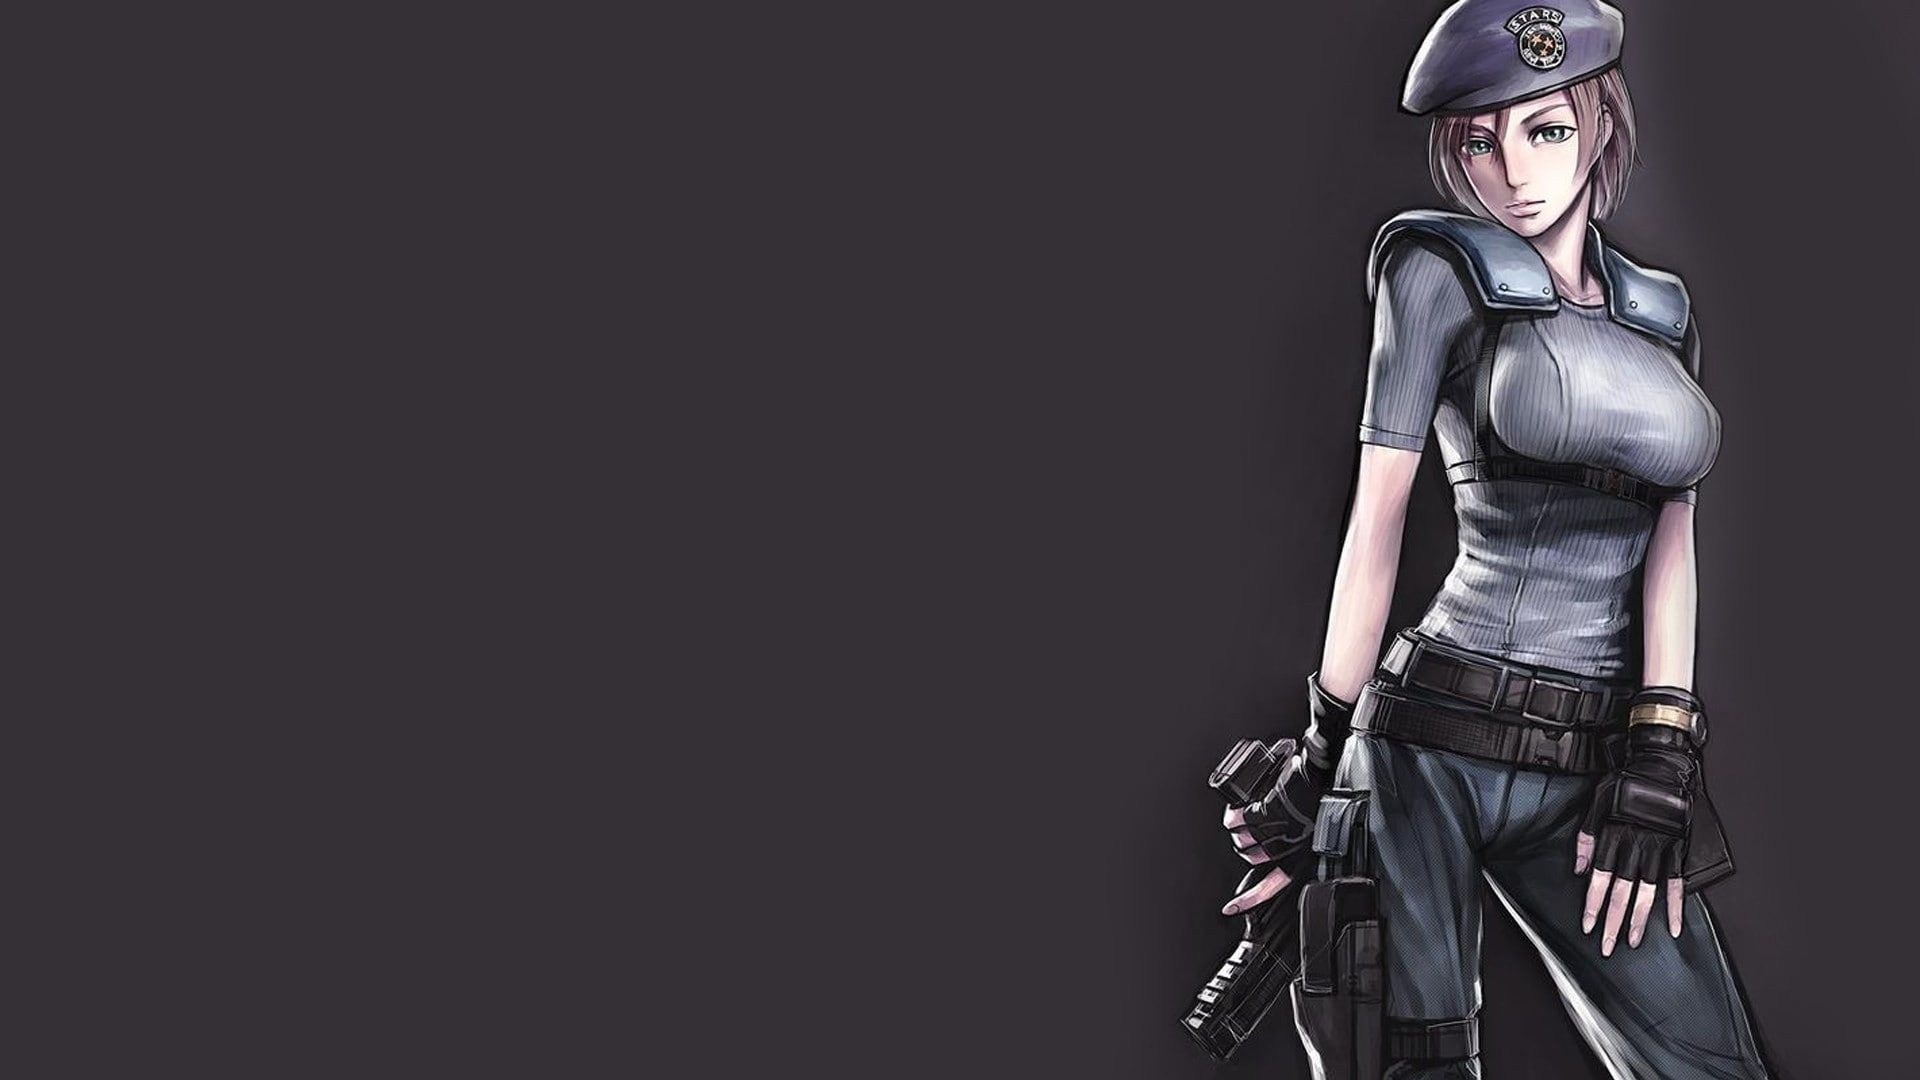 Resident Evil Jill Valentine Anime Simple Background Video Games